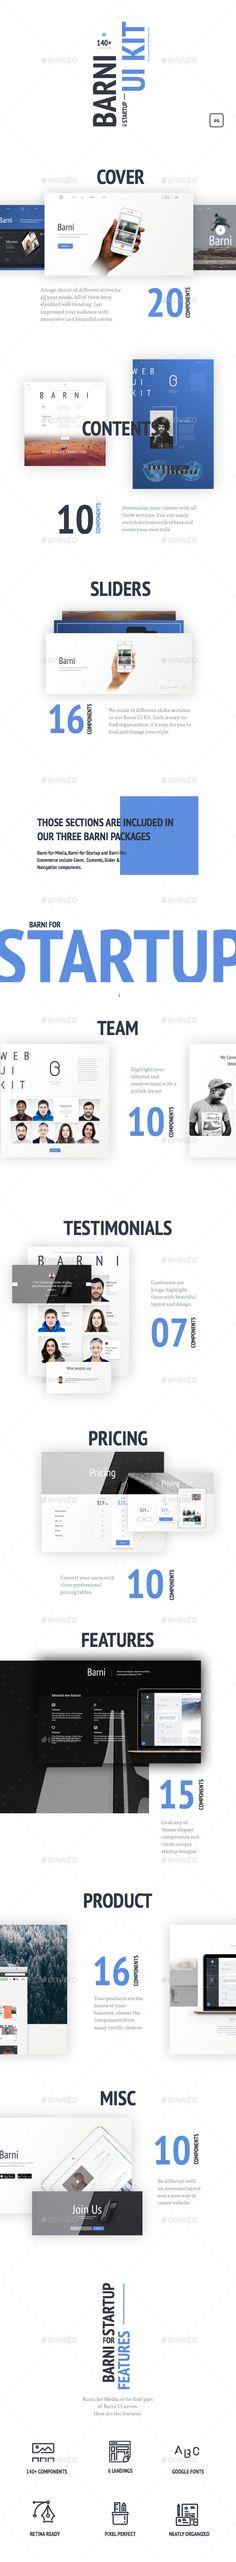 Barni for Startup UI Kit (User Interfaces)